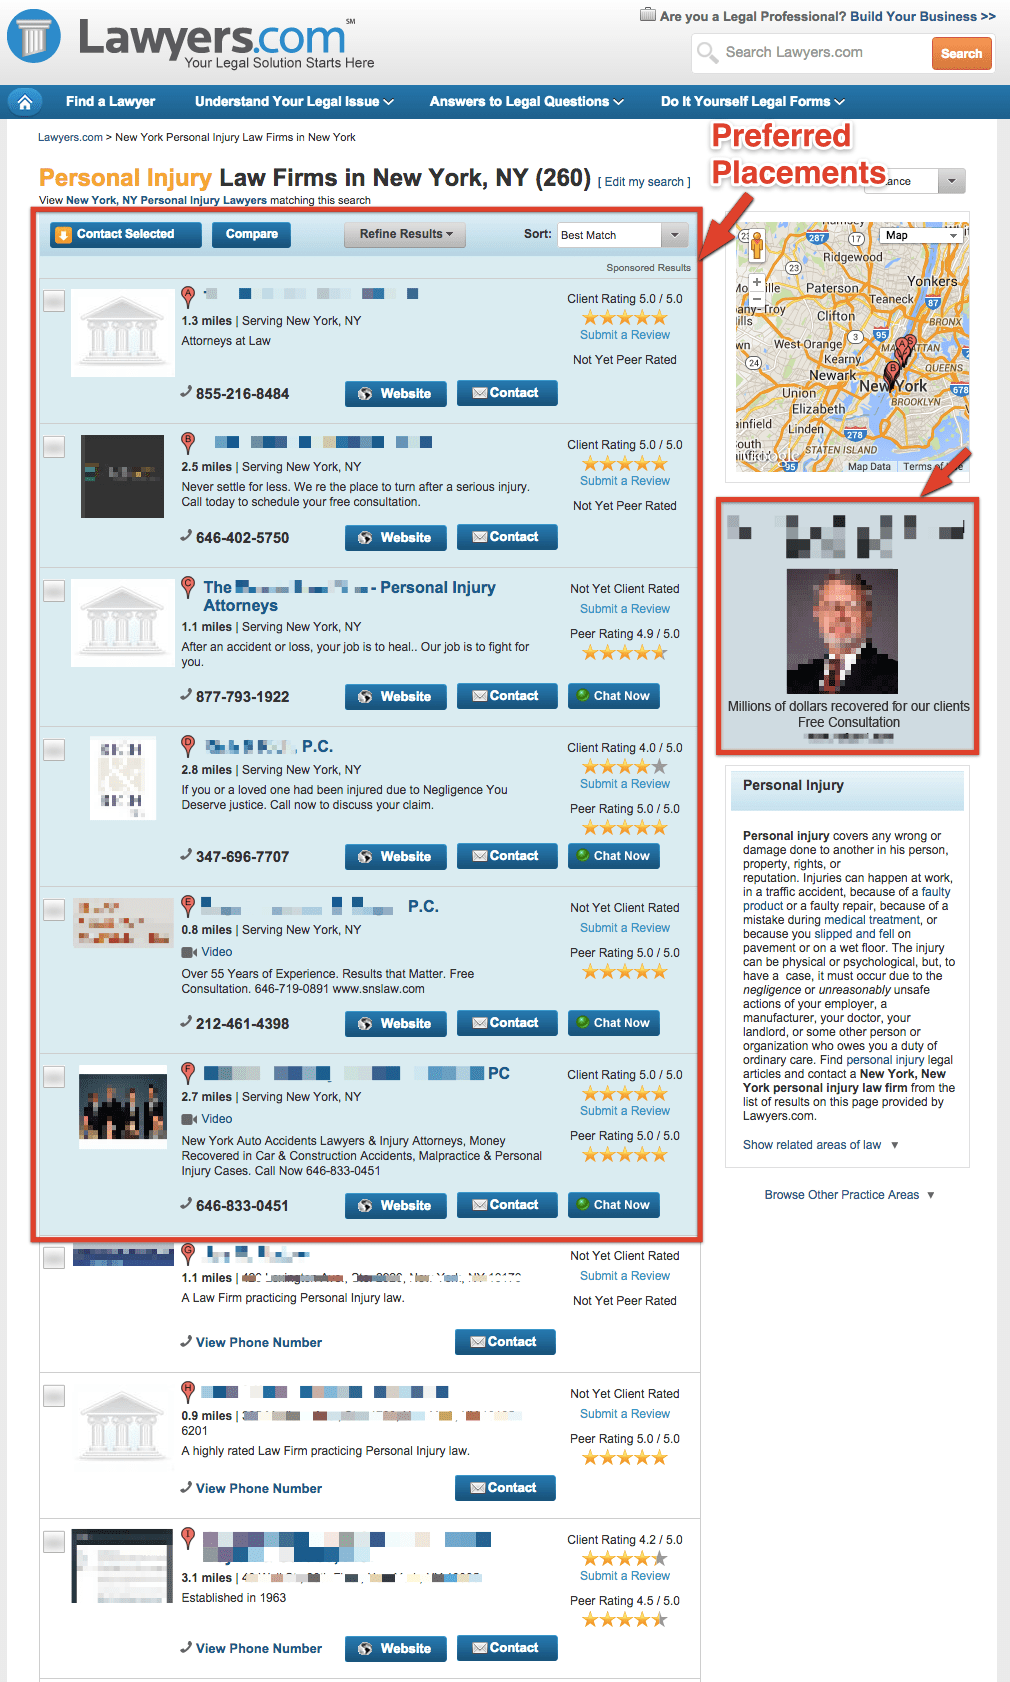 Preferred Placements - Postali LLC